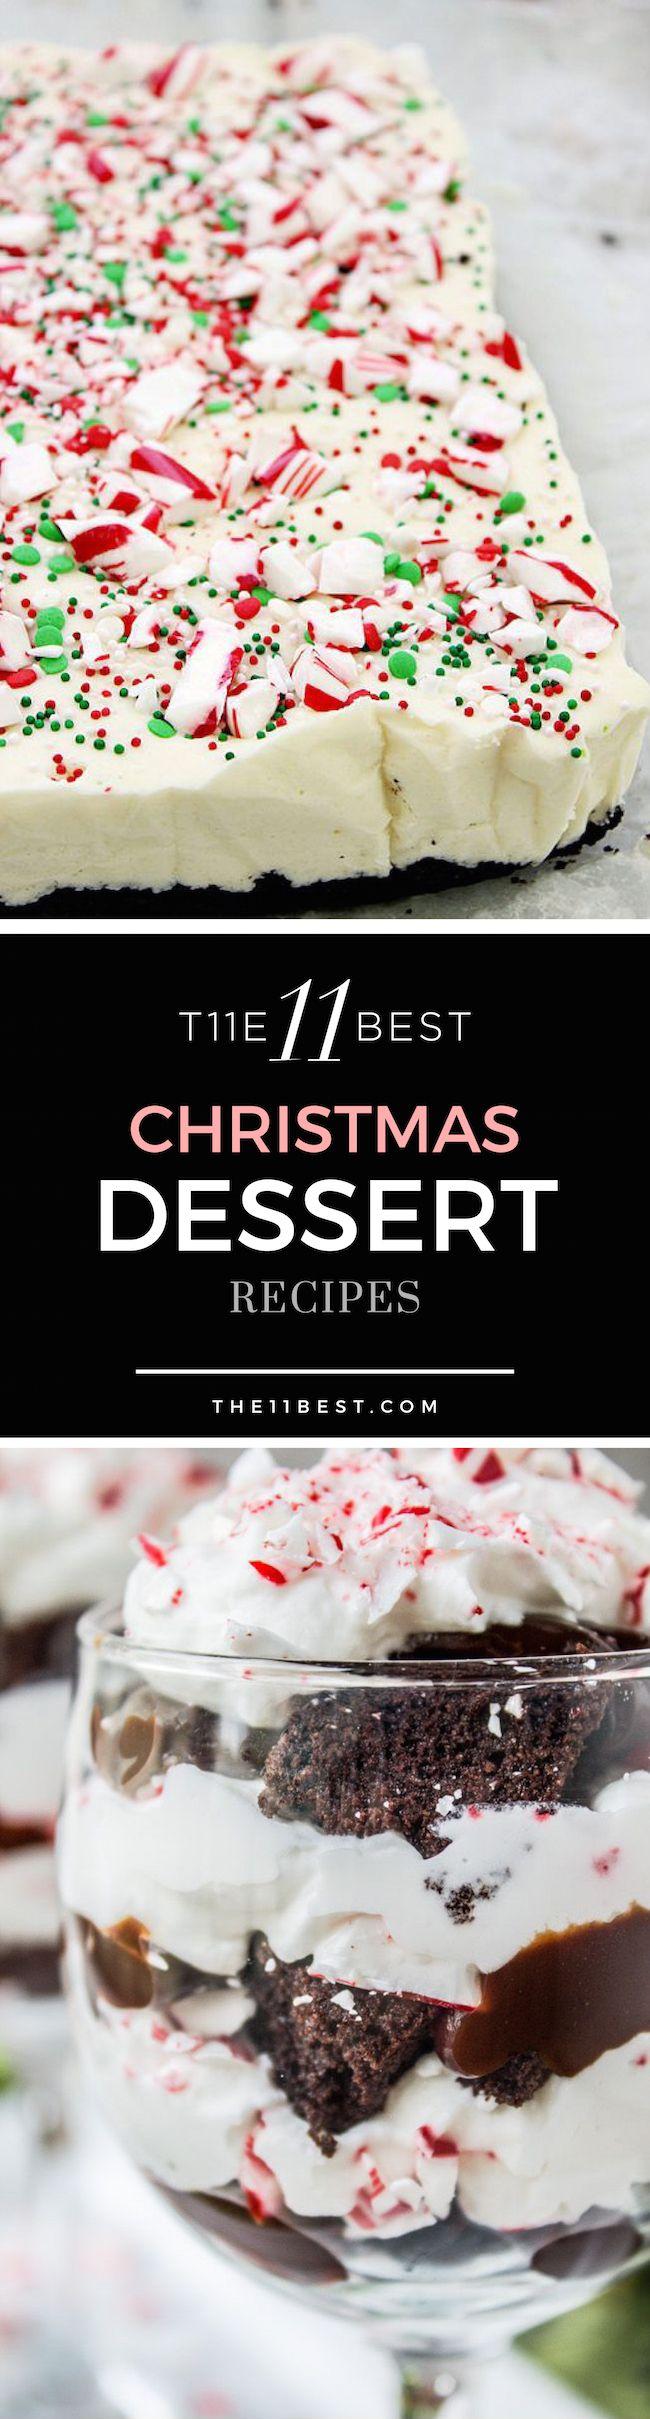 The 11 Best Christmas Dessert Recipes